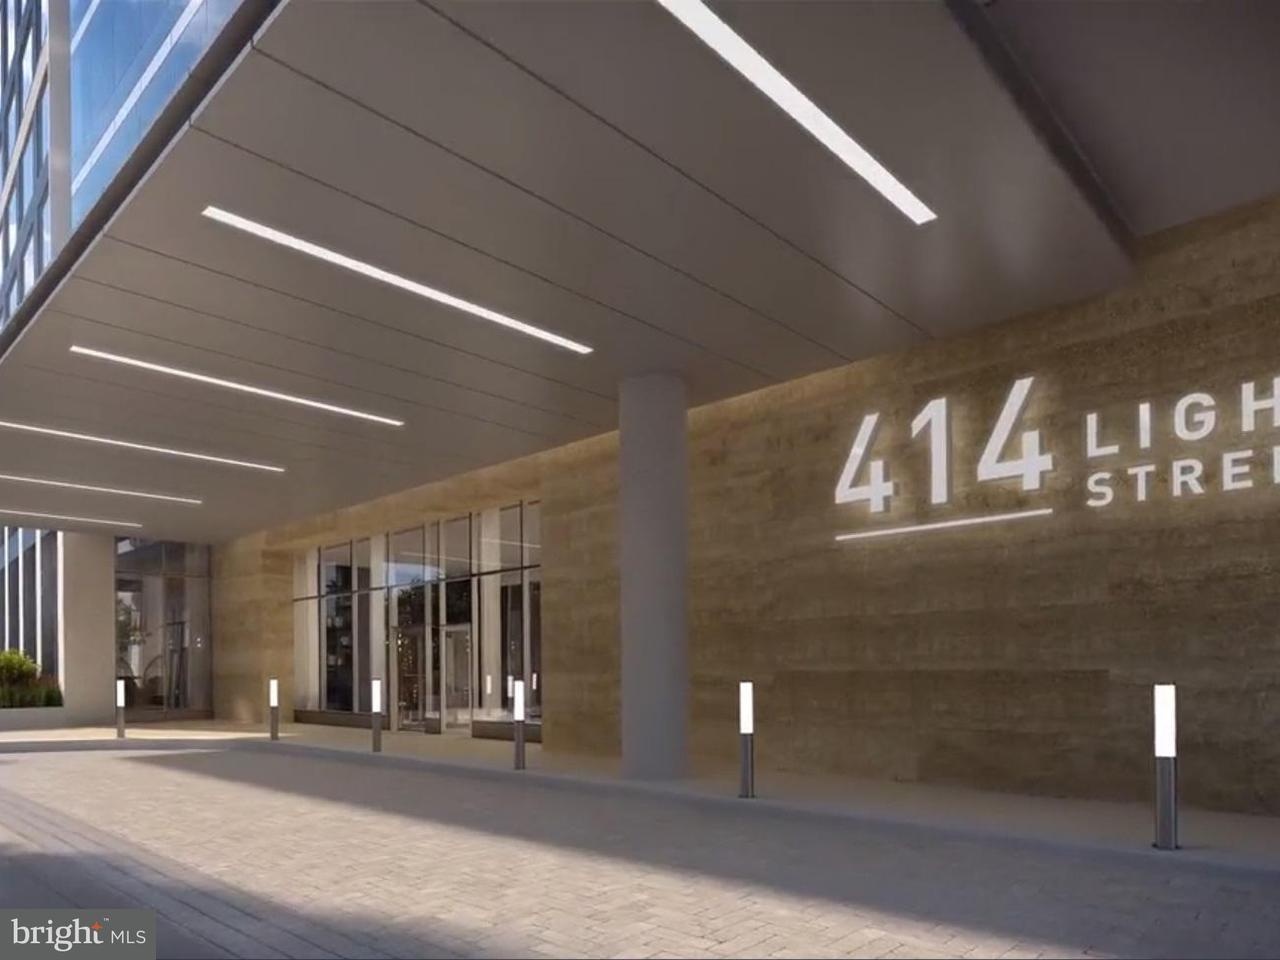 Condominium for Rent at 414 Light St #209 Baltimore, Maryland 21202 United States